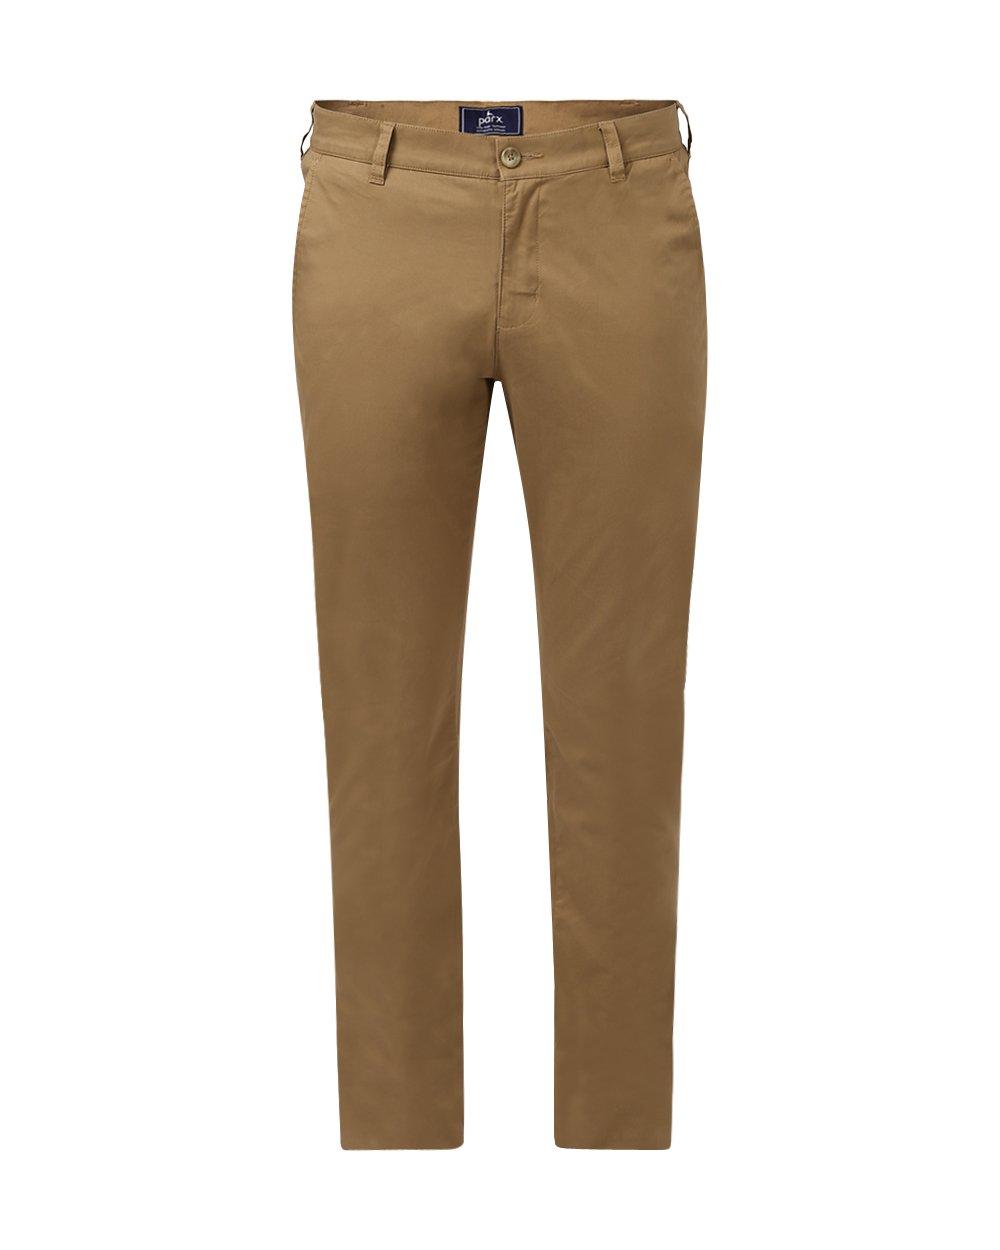 PARX | Parx Medium Khaki Trouser